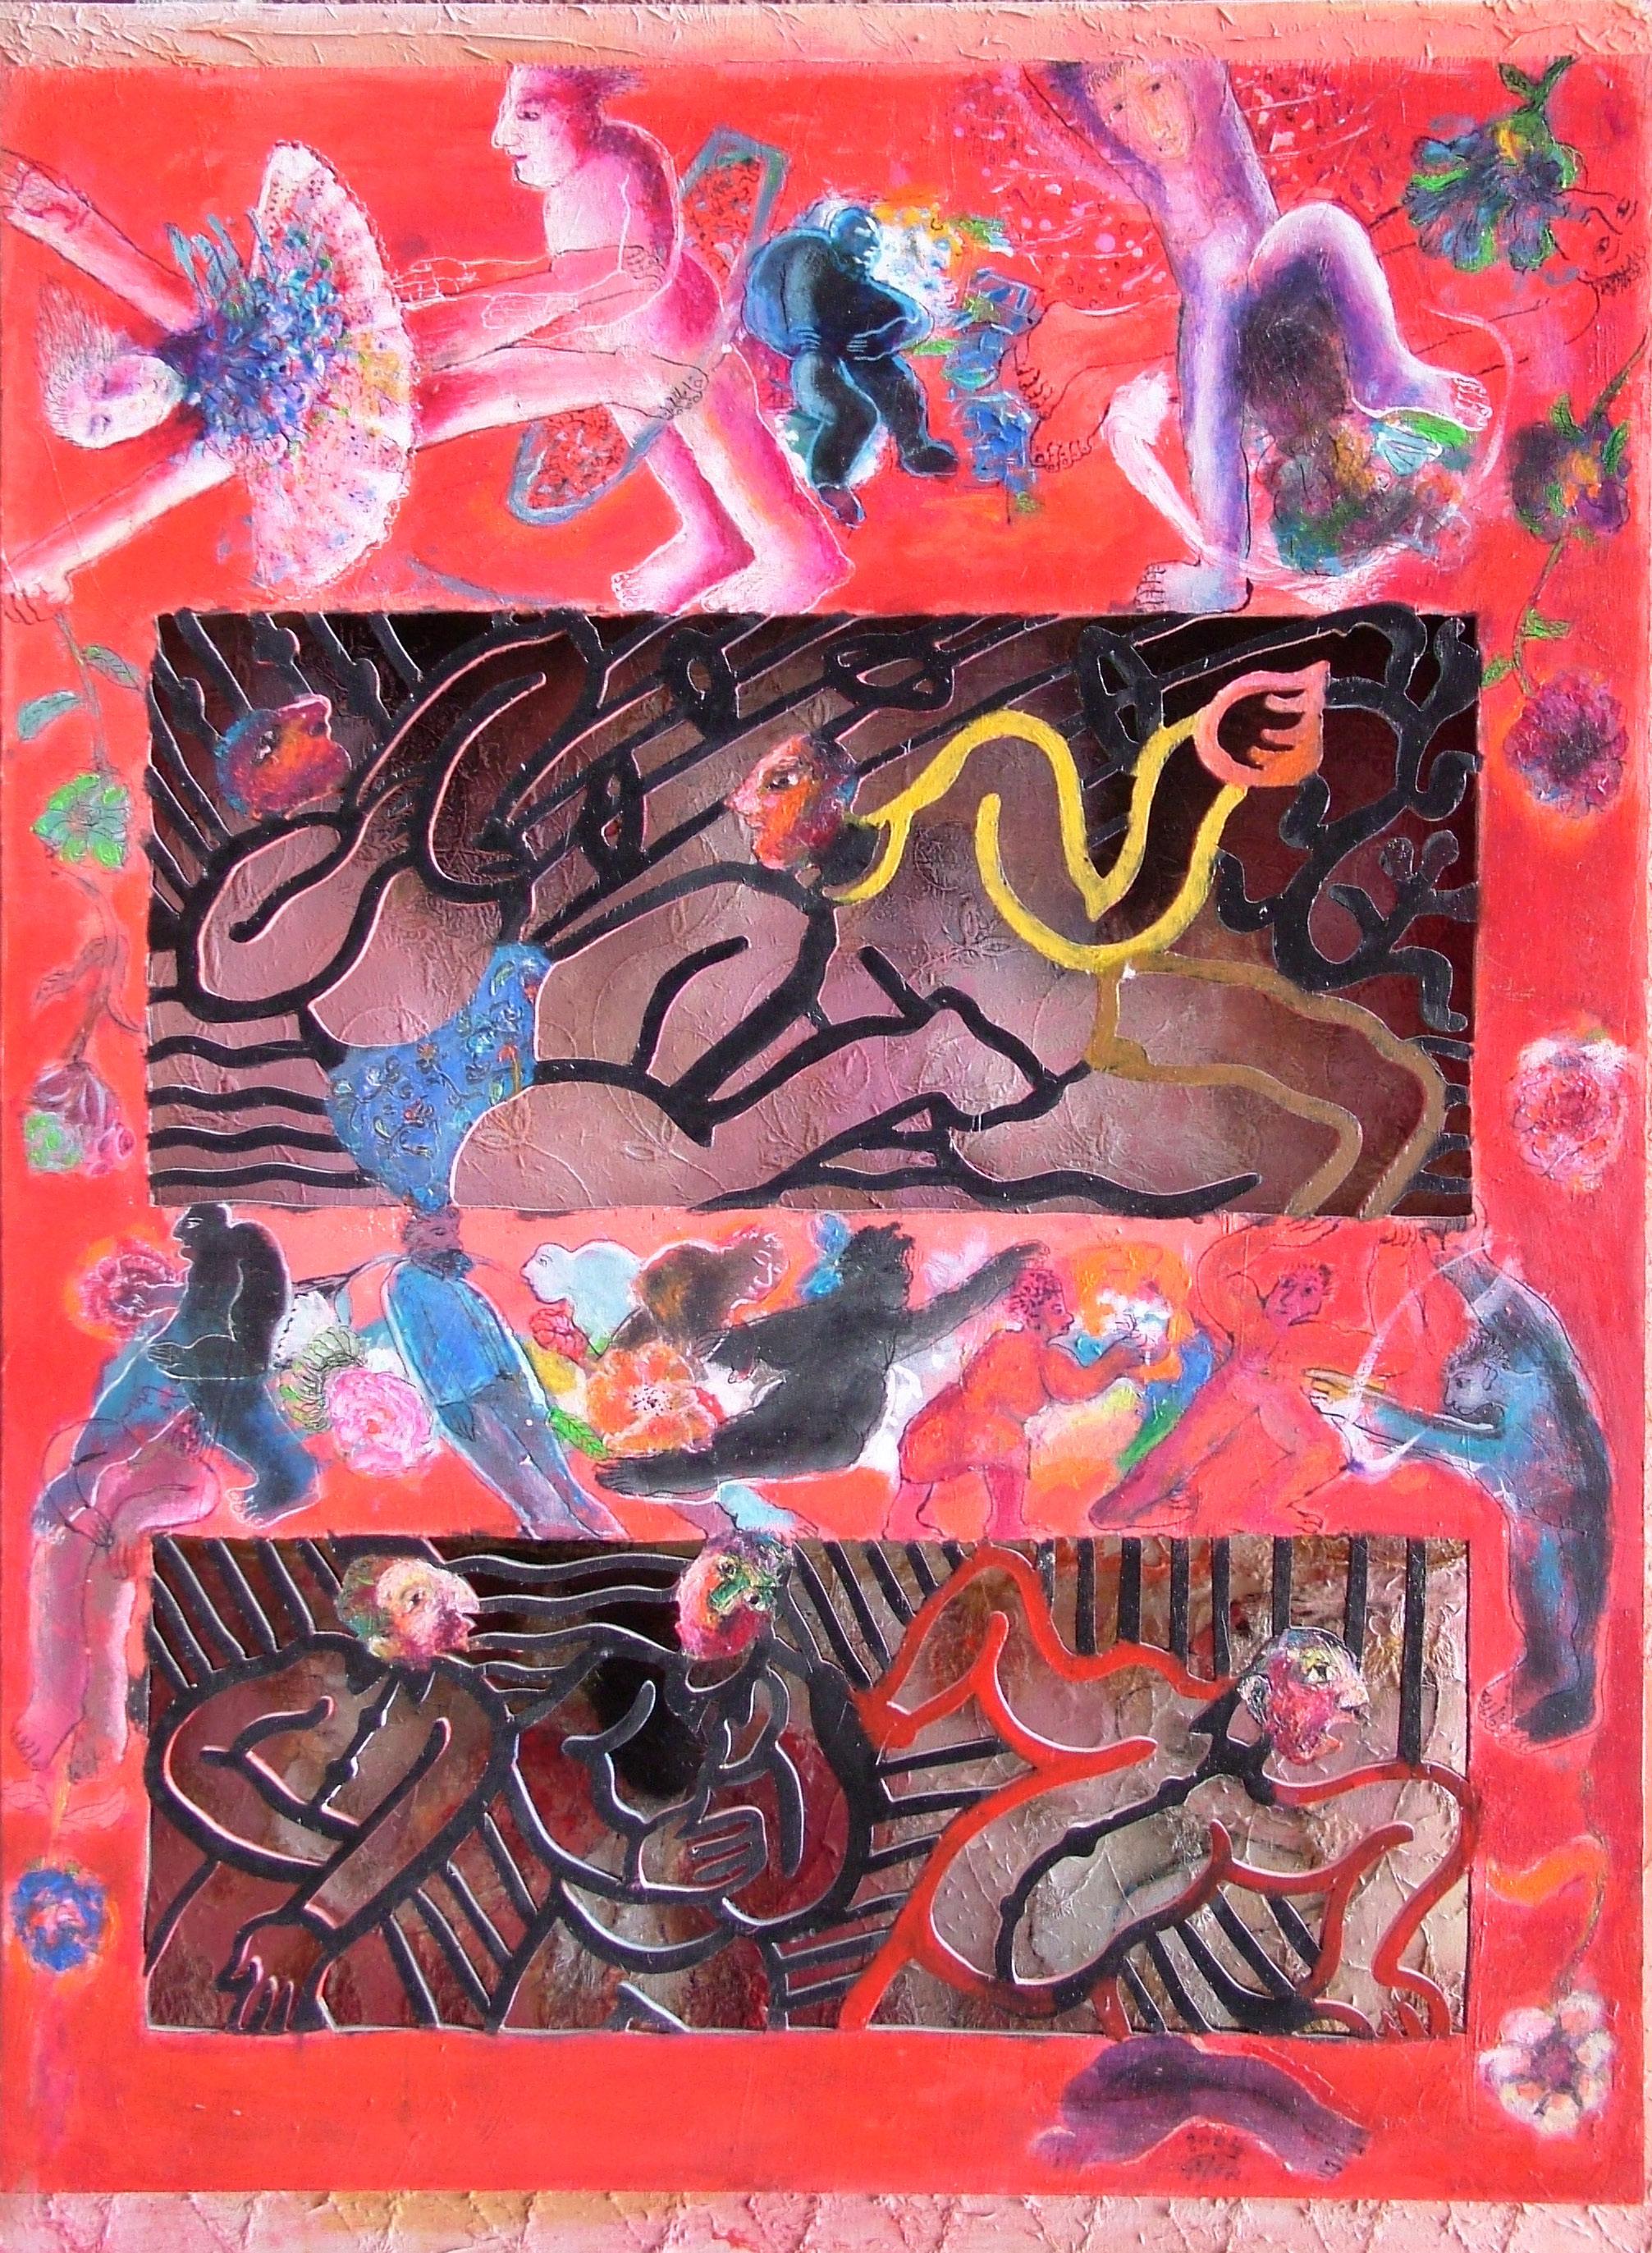 Touchings, 2005